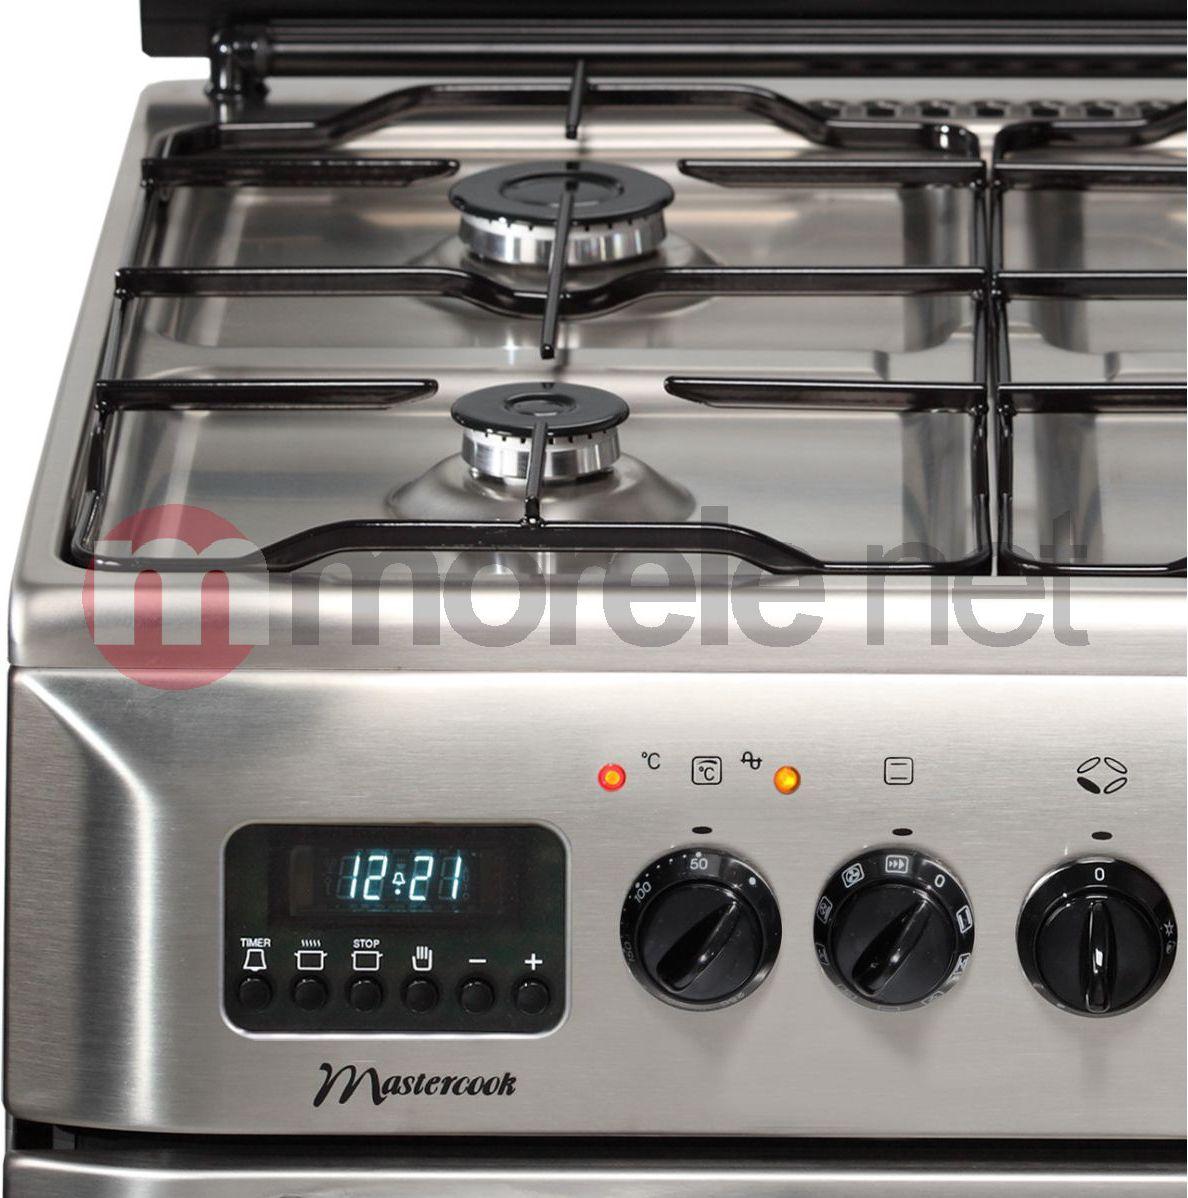 Mastercook KGE 7336 ZX PLUS w Morele net -> Kuchnia Gazowa Mastercook Plus